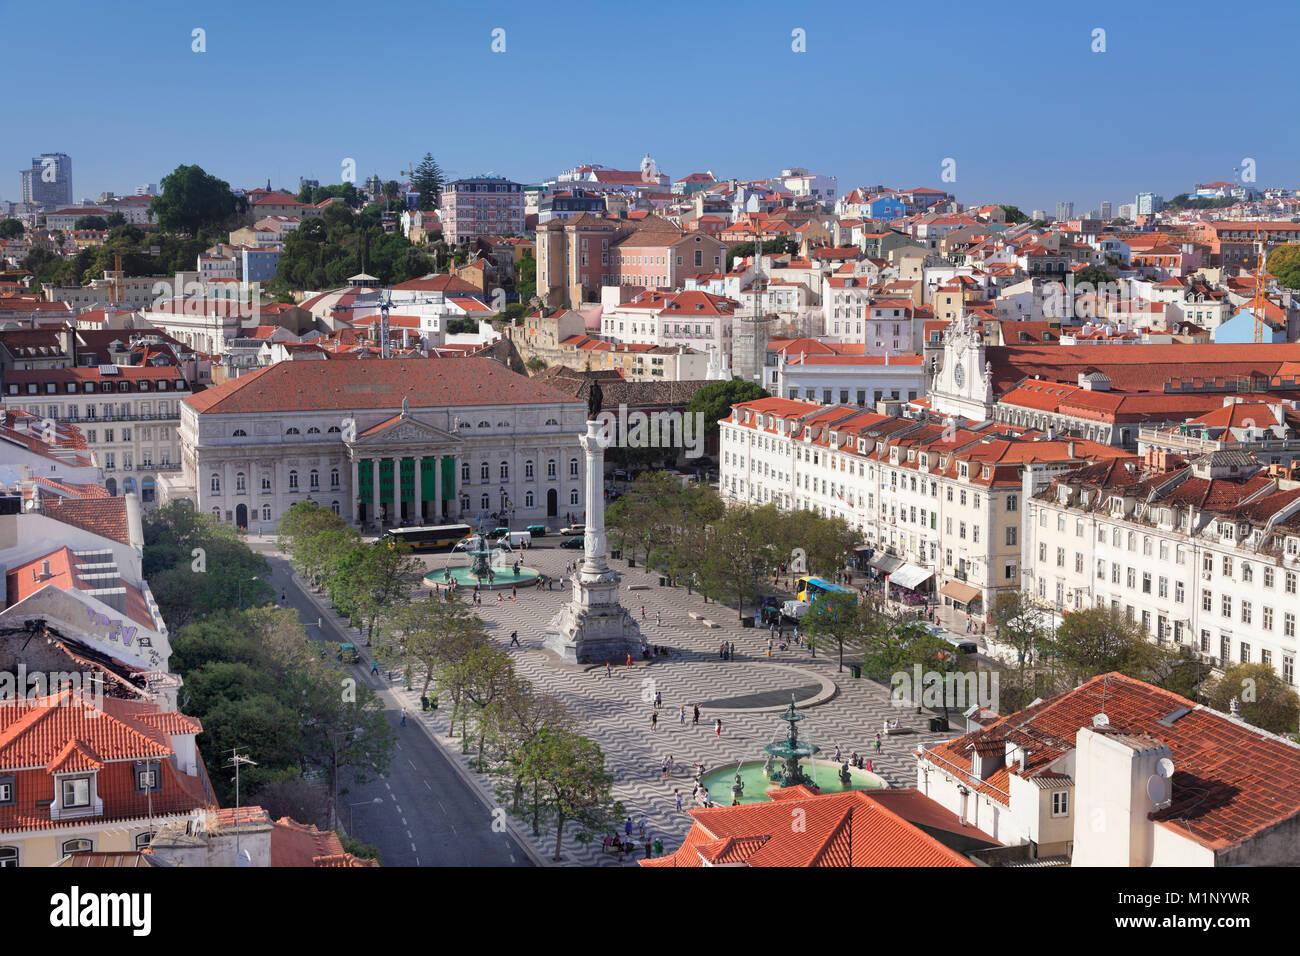 Rossio, Praca Dom Pedro IV, National Theatre Dona Maria II, Baixa, Lisbon, Portugal, Europe - Stock Image